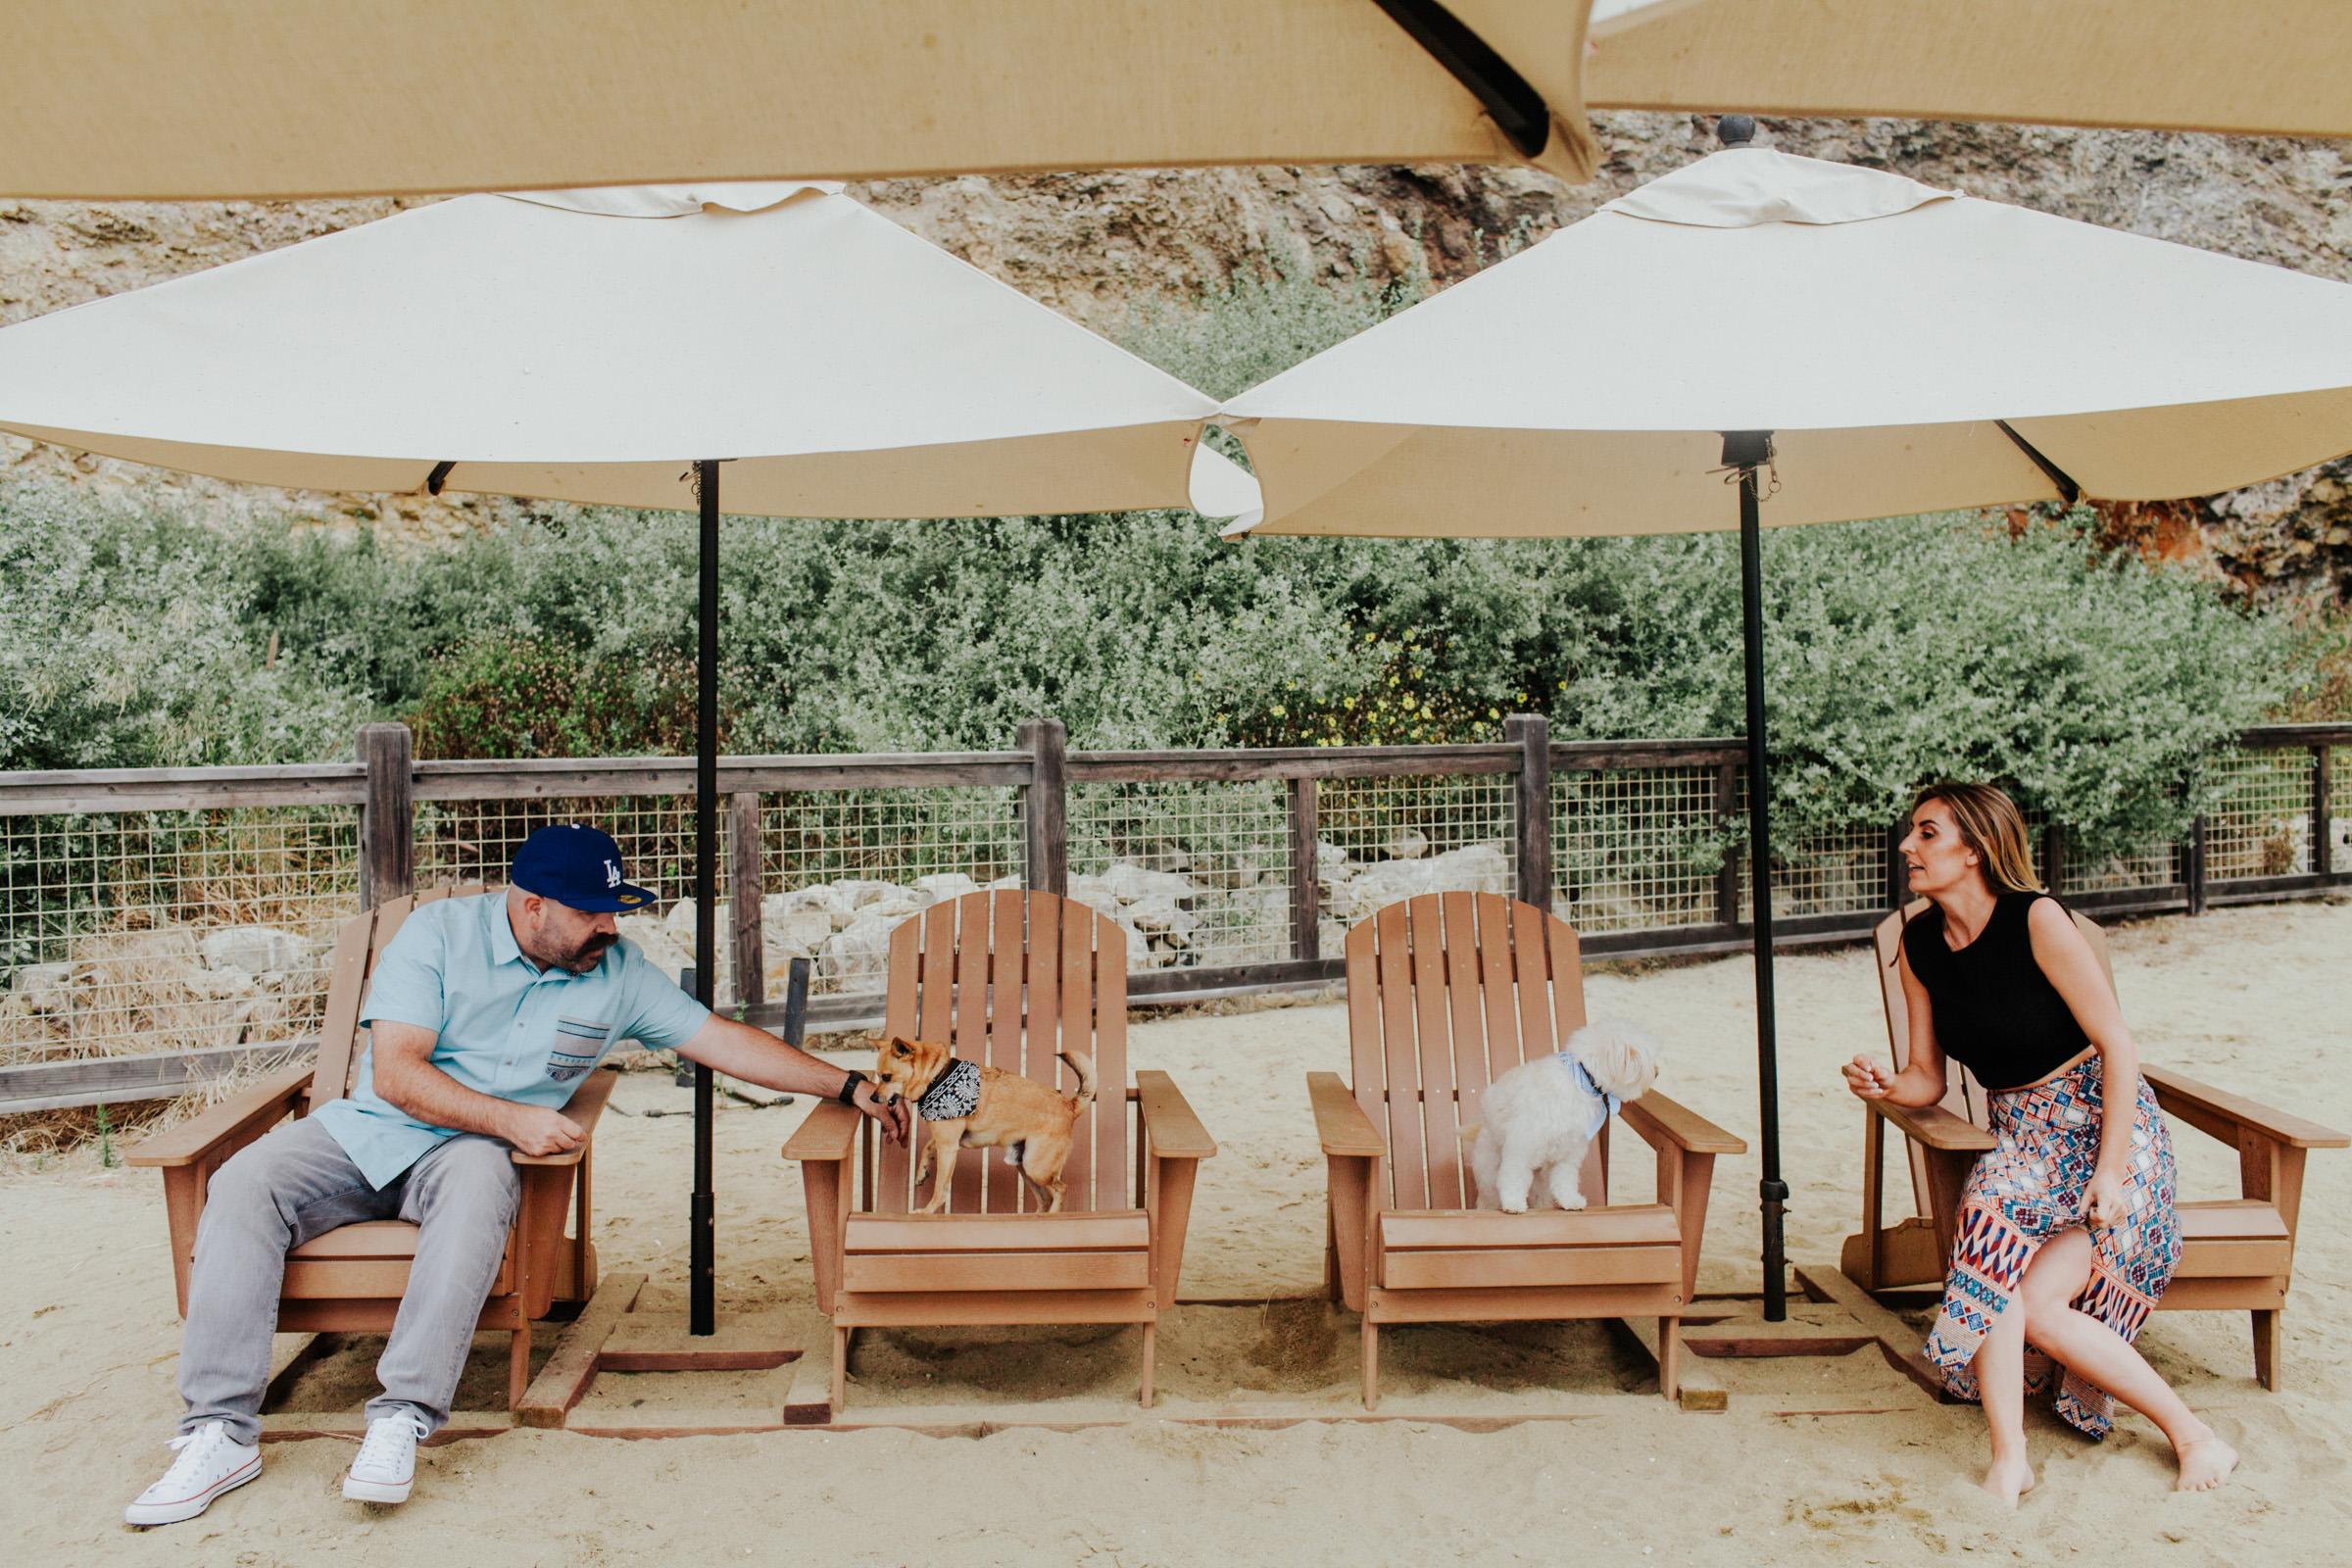 terranea-resort-palos-verdes-california-wedding-photography-cove-los-angeles-pierce-129.jpg